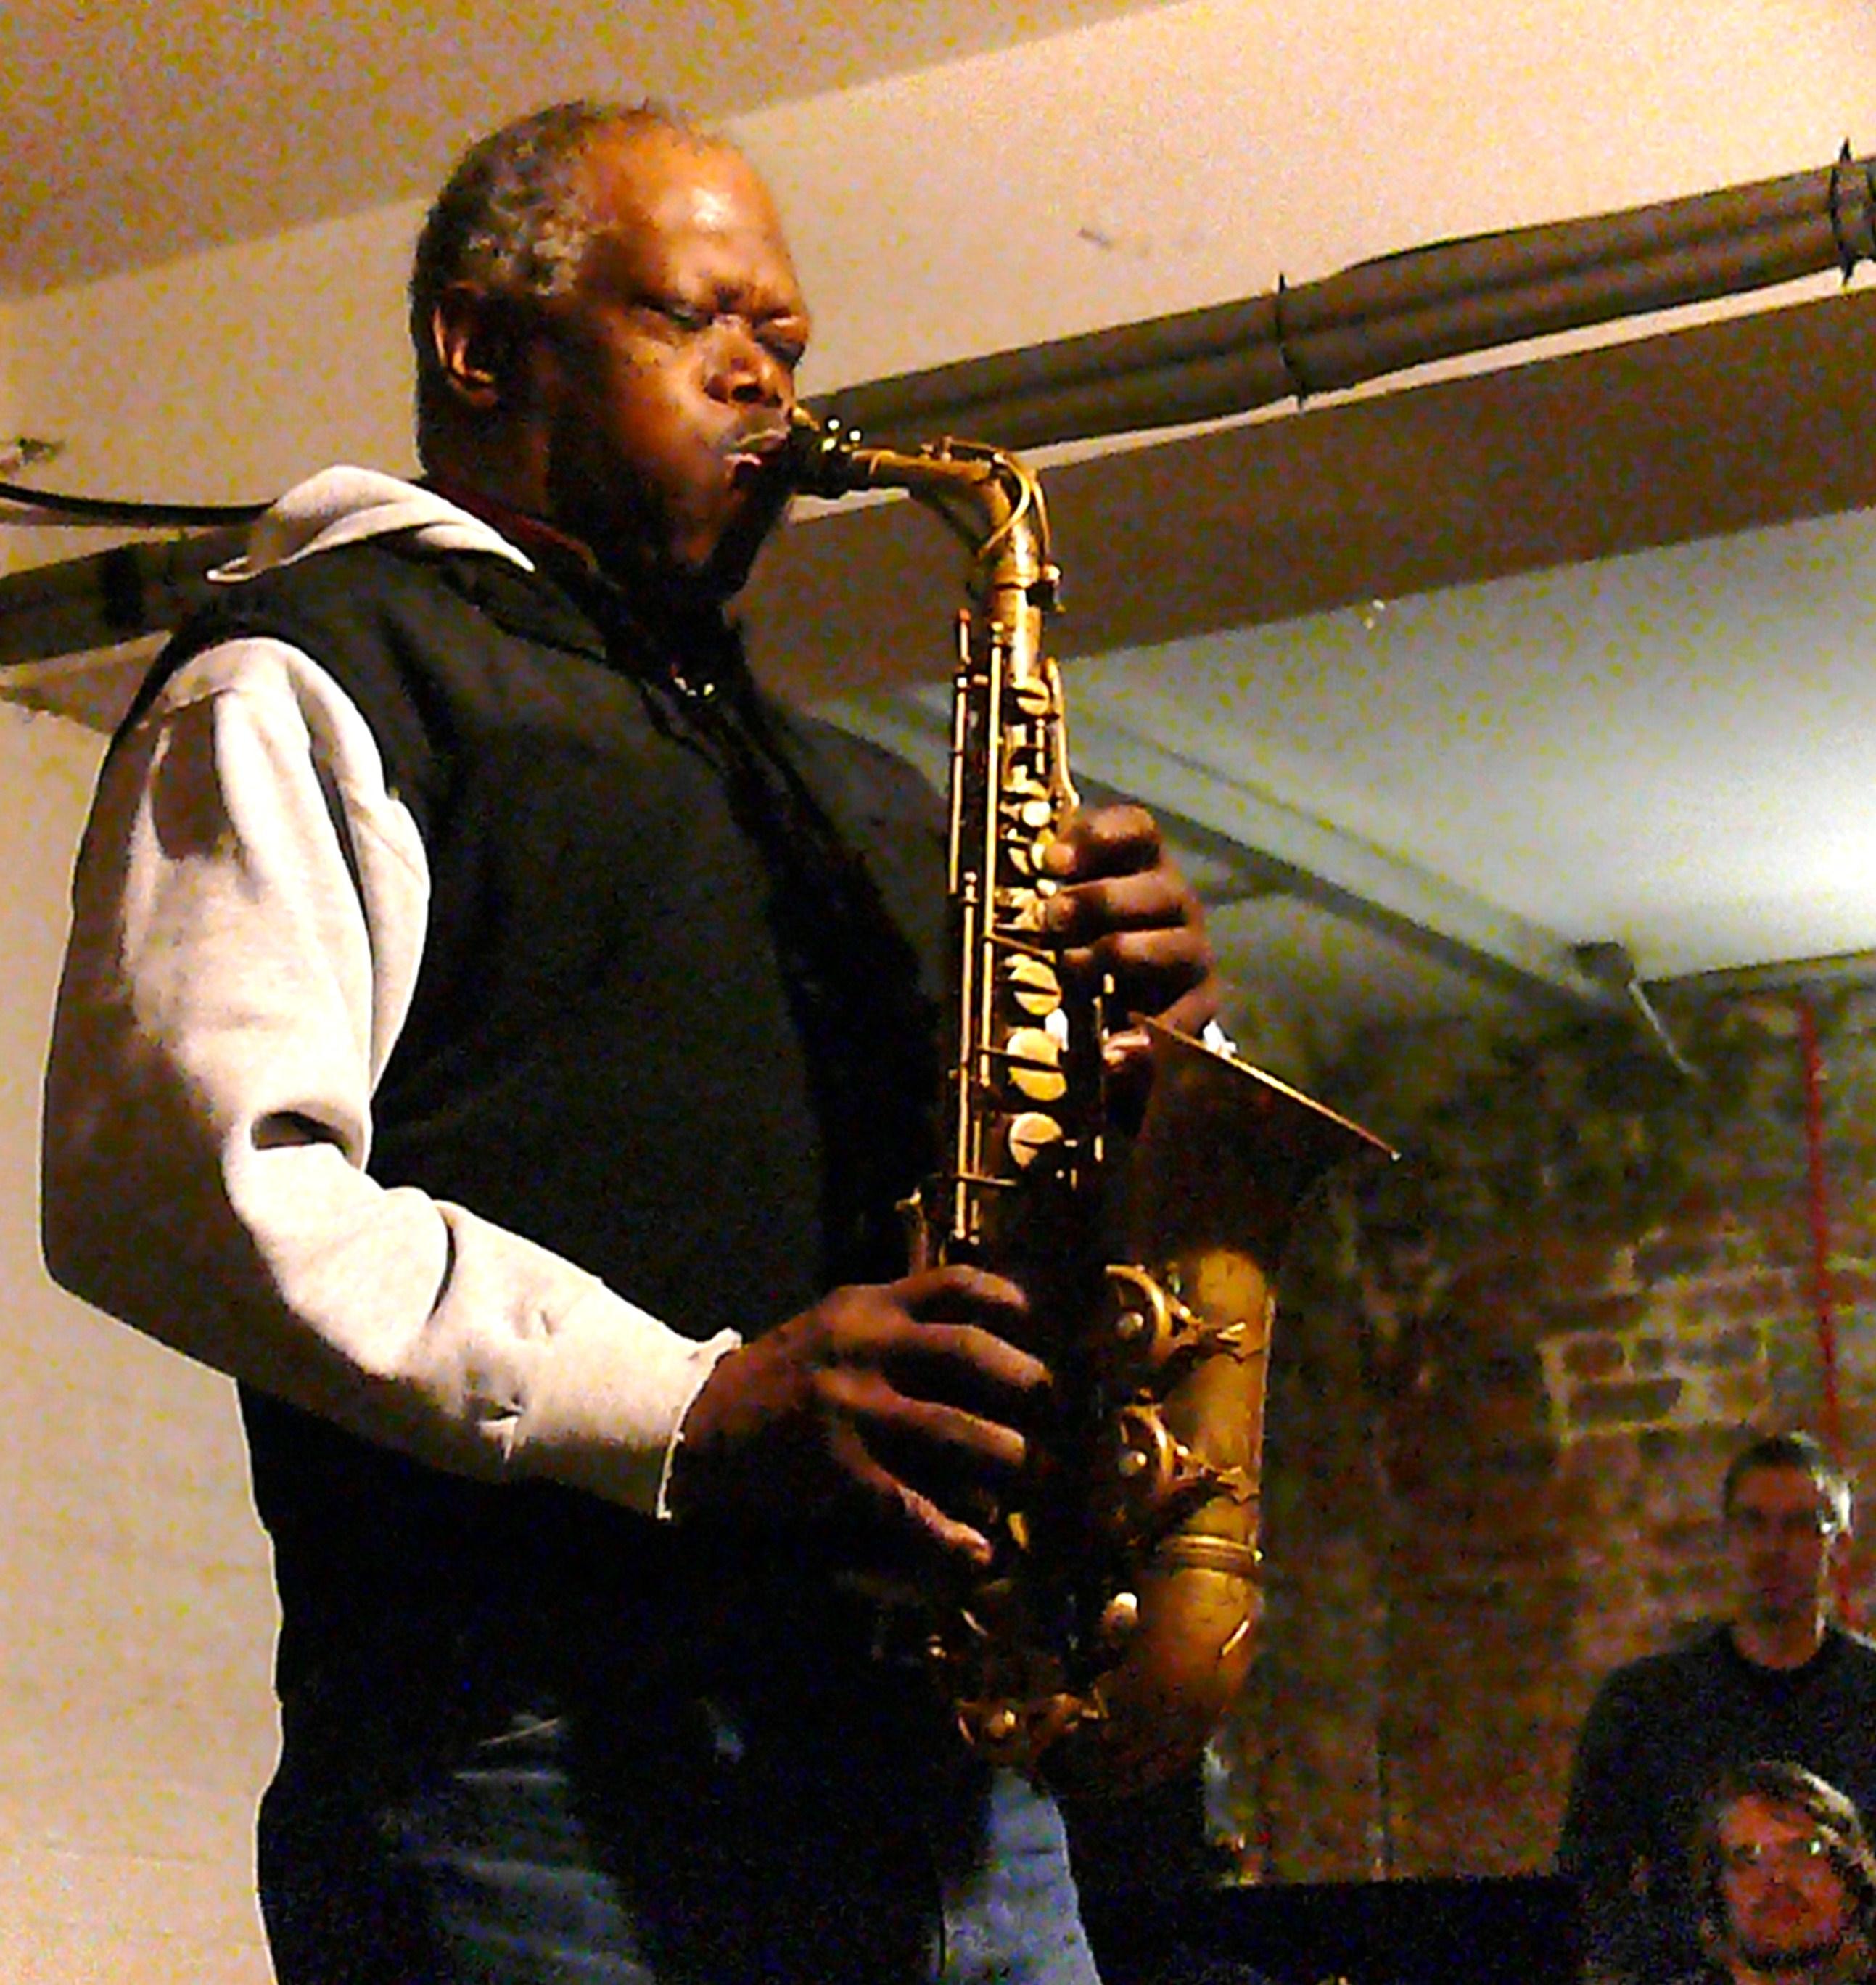 Joe McPhee at Cafe Oto, London, March 2010